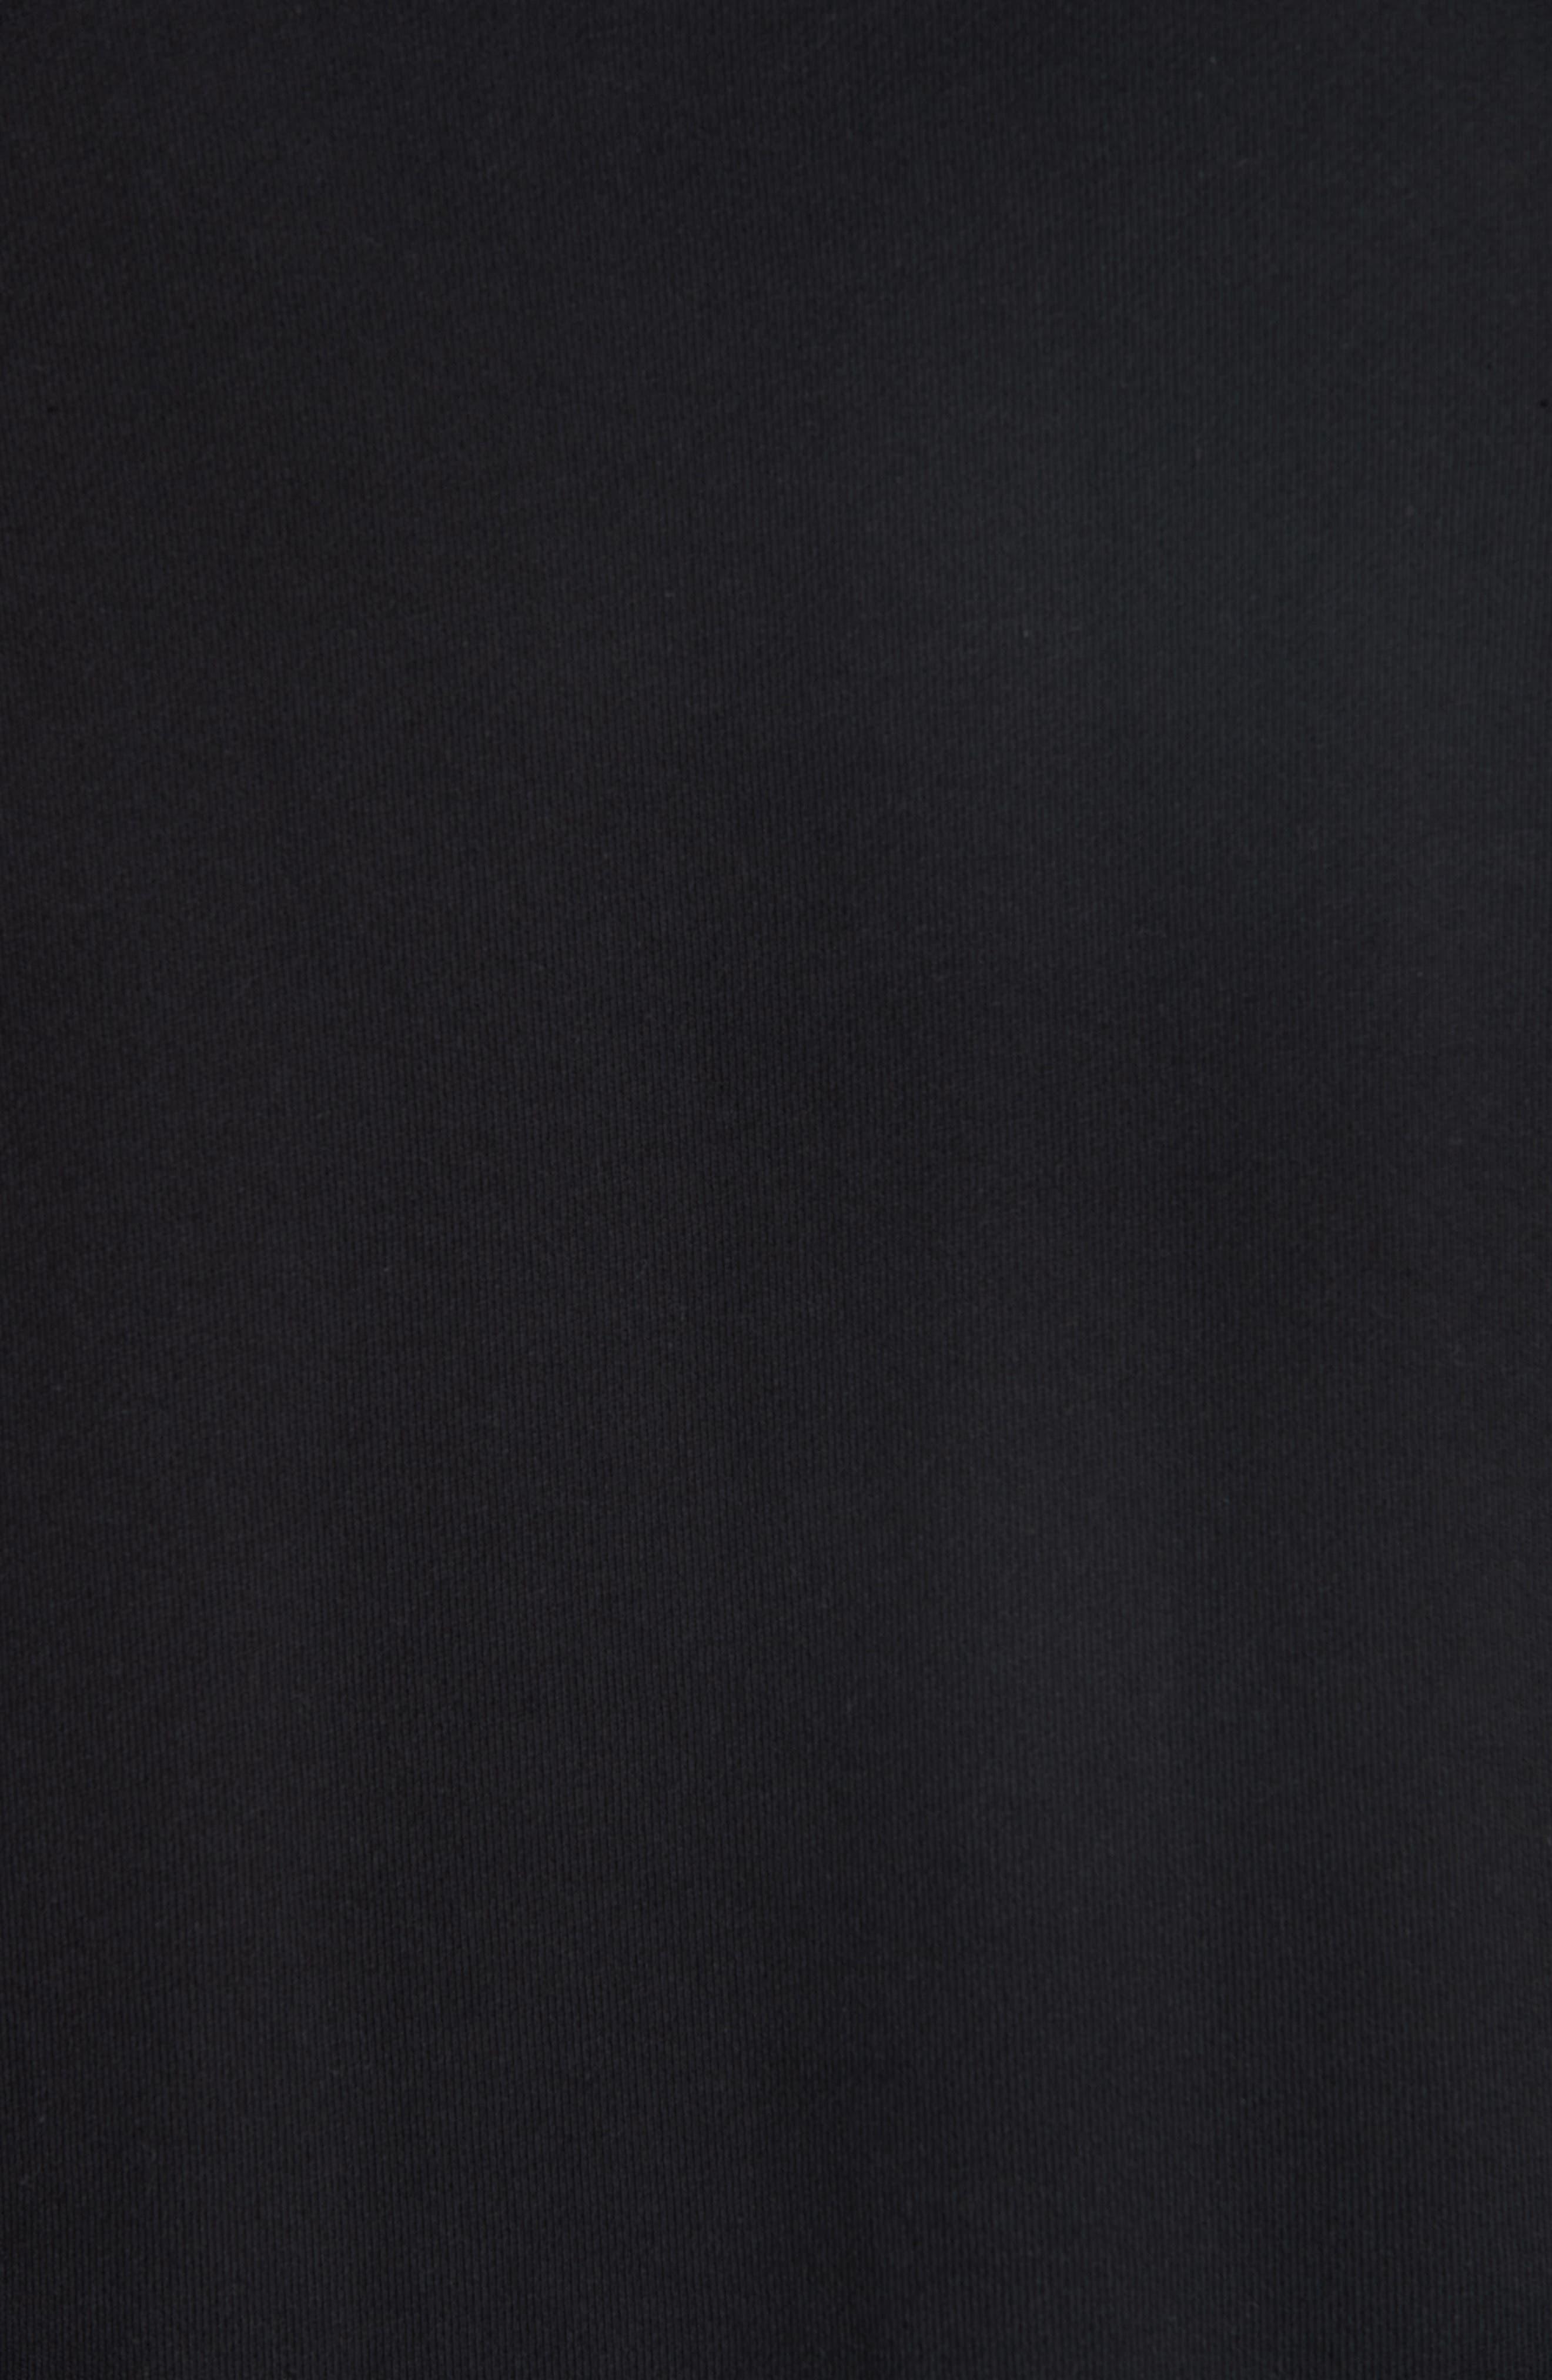 Raglan Crewneck Sweatshirt,                             Alternate thumbnail 5, color,                             BLACK